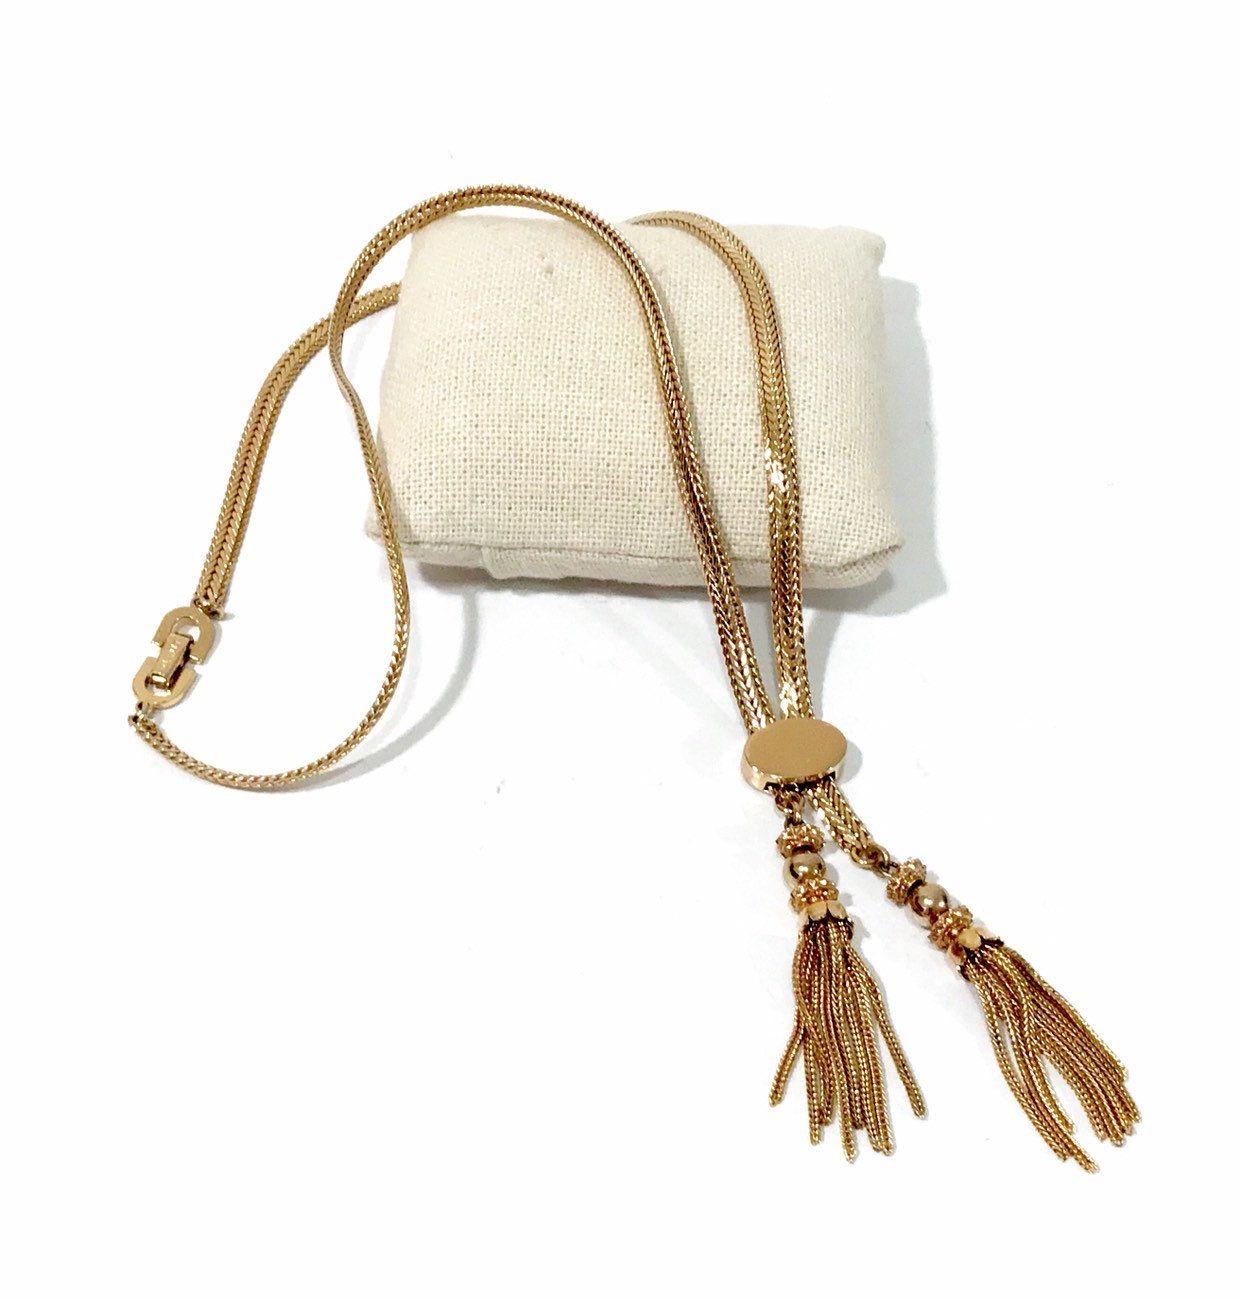 Retro Jewelry Circa 1960/'s Bolo Slide Necklace Vintage Tassel Lariat Necklace